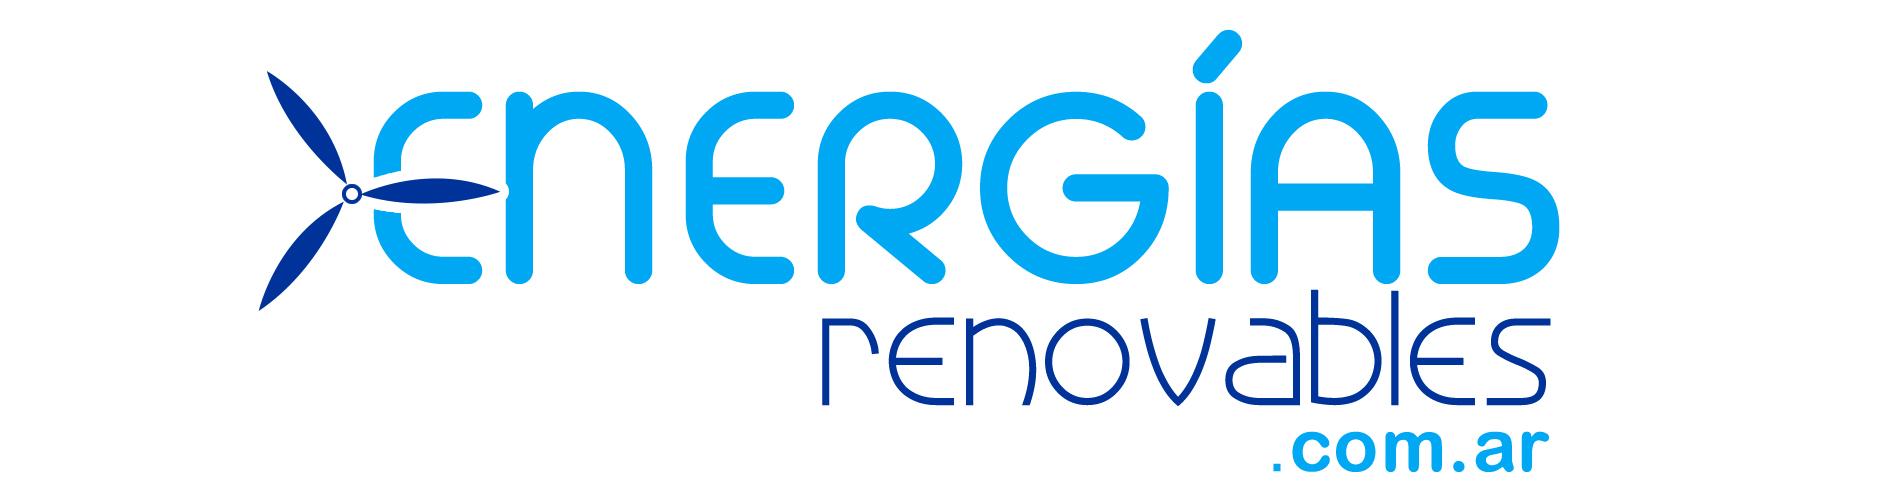 Energías Renovables Argentina-Energía Renovable-Energía Solar-Energía eólica-Biomasa-Biogás-Biodiesel-Etanol-Bioetanol-biocombustibles